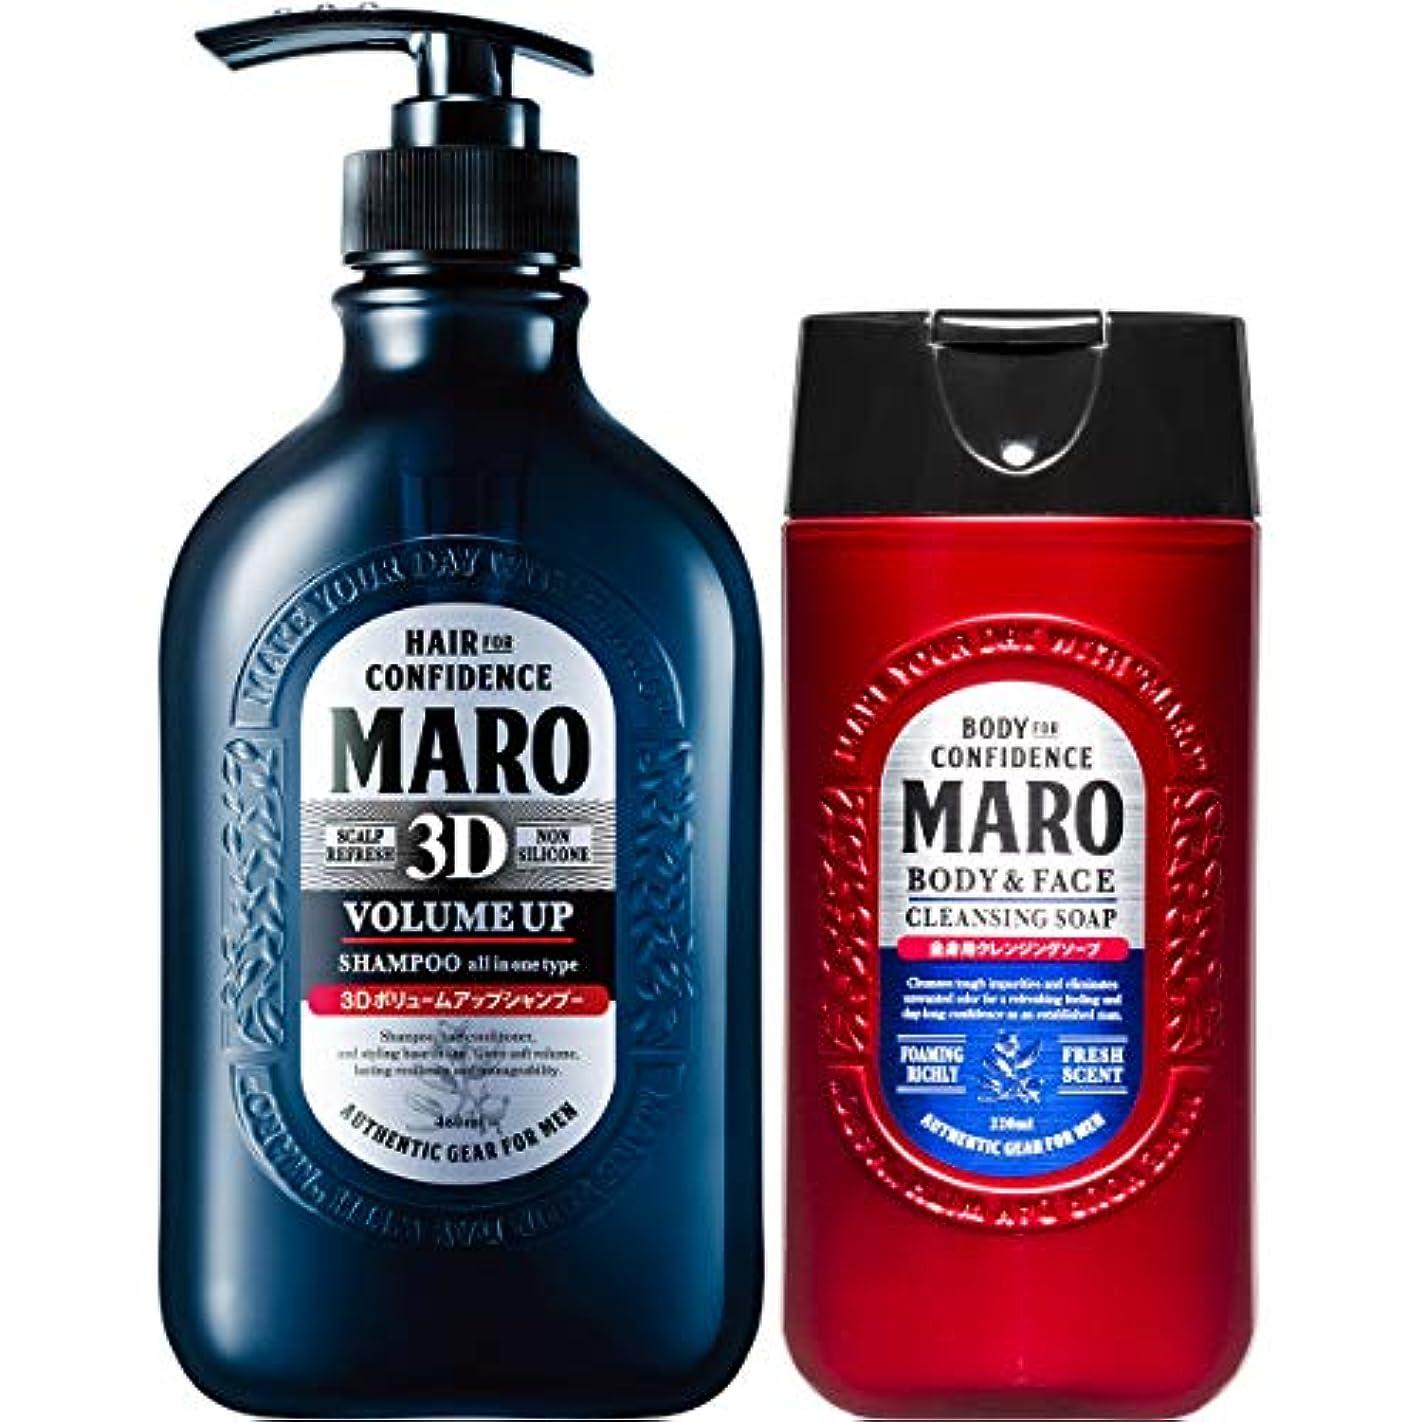 MARO 3DボリュームアップシャンプーEX クレンジングソープ付 460ml+220ml